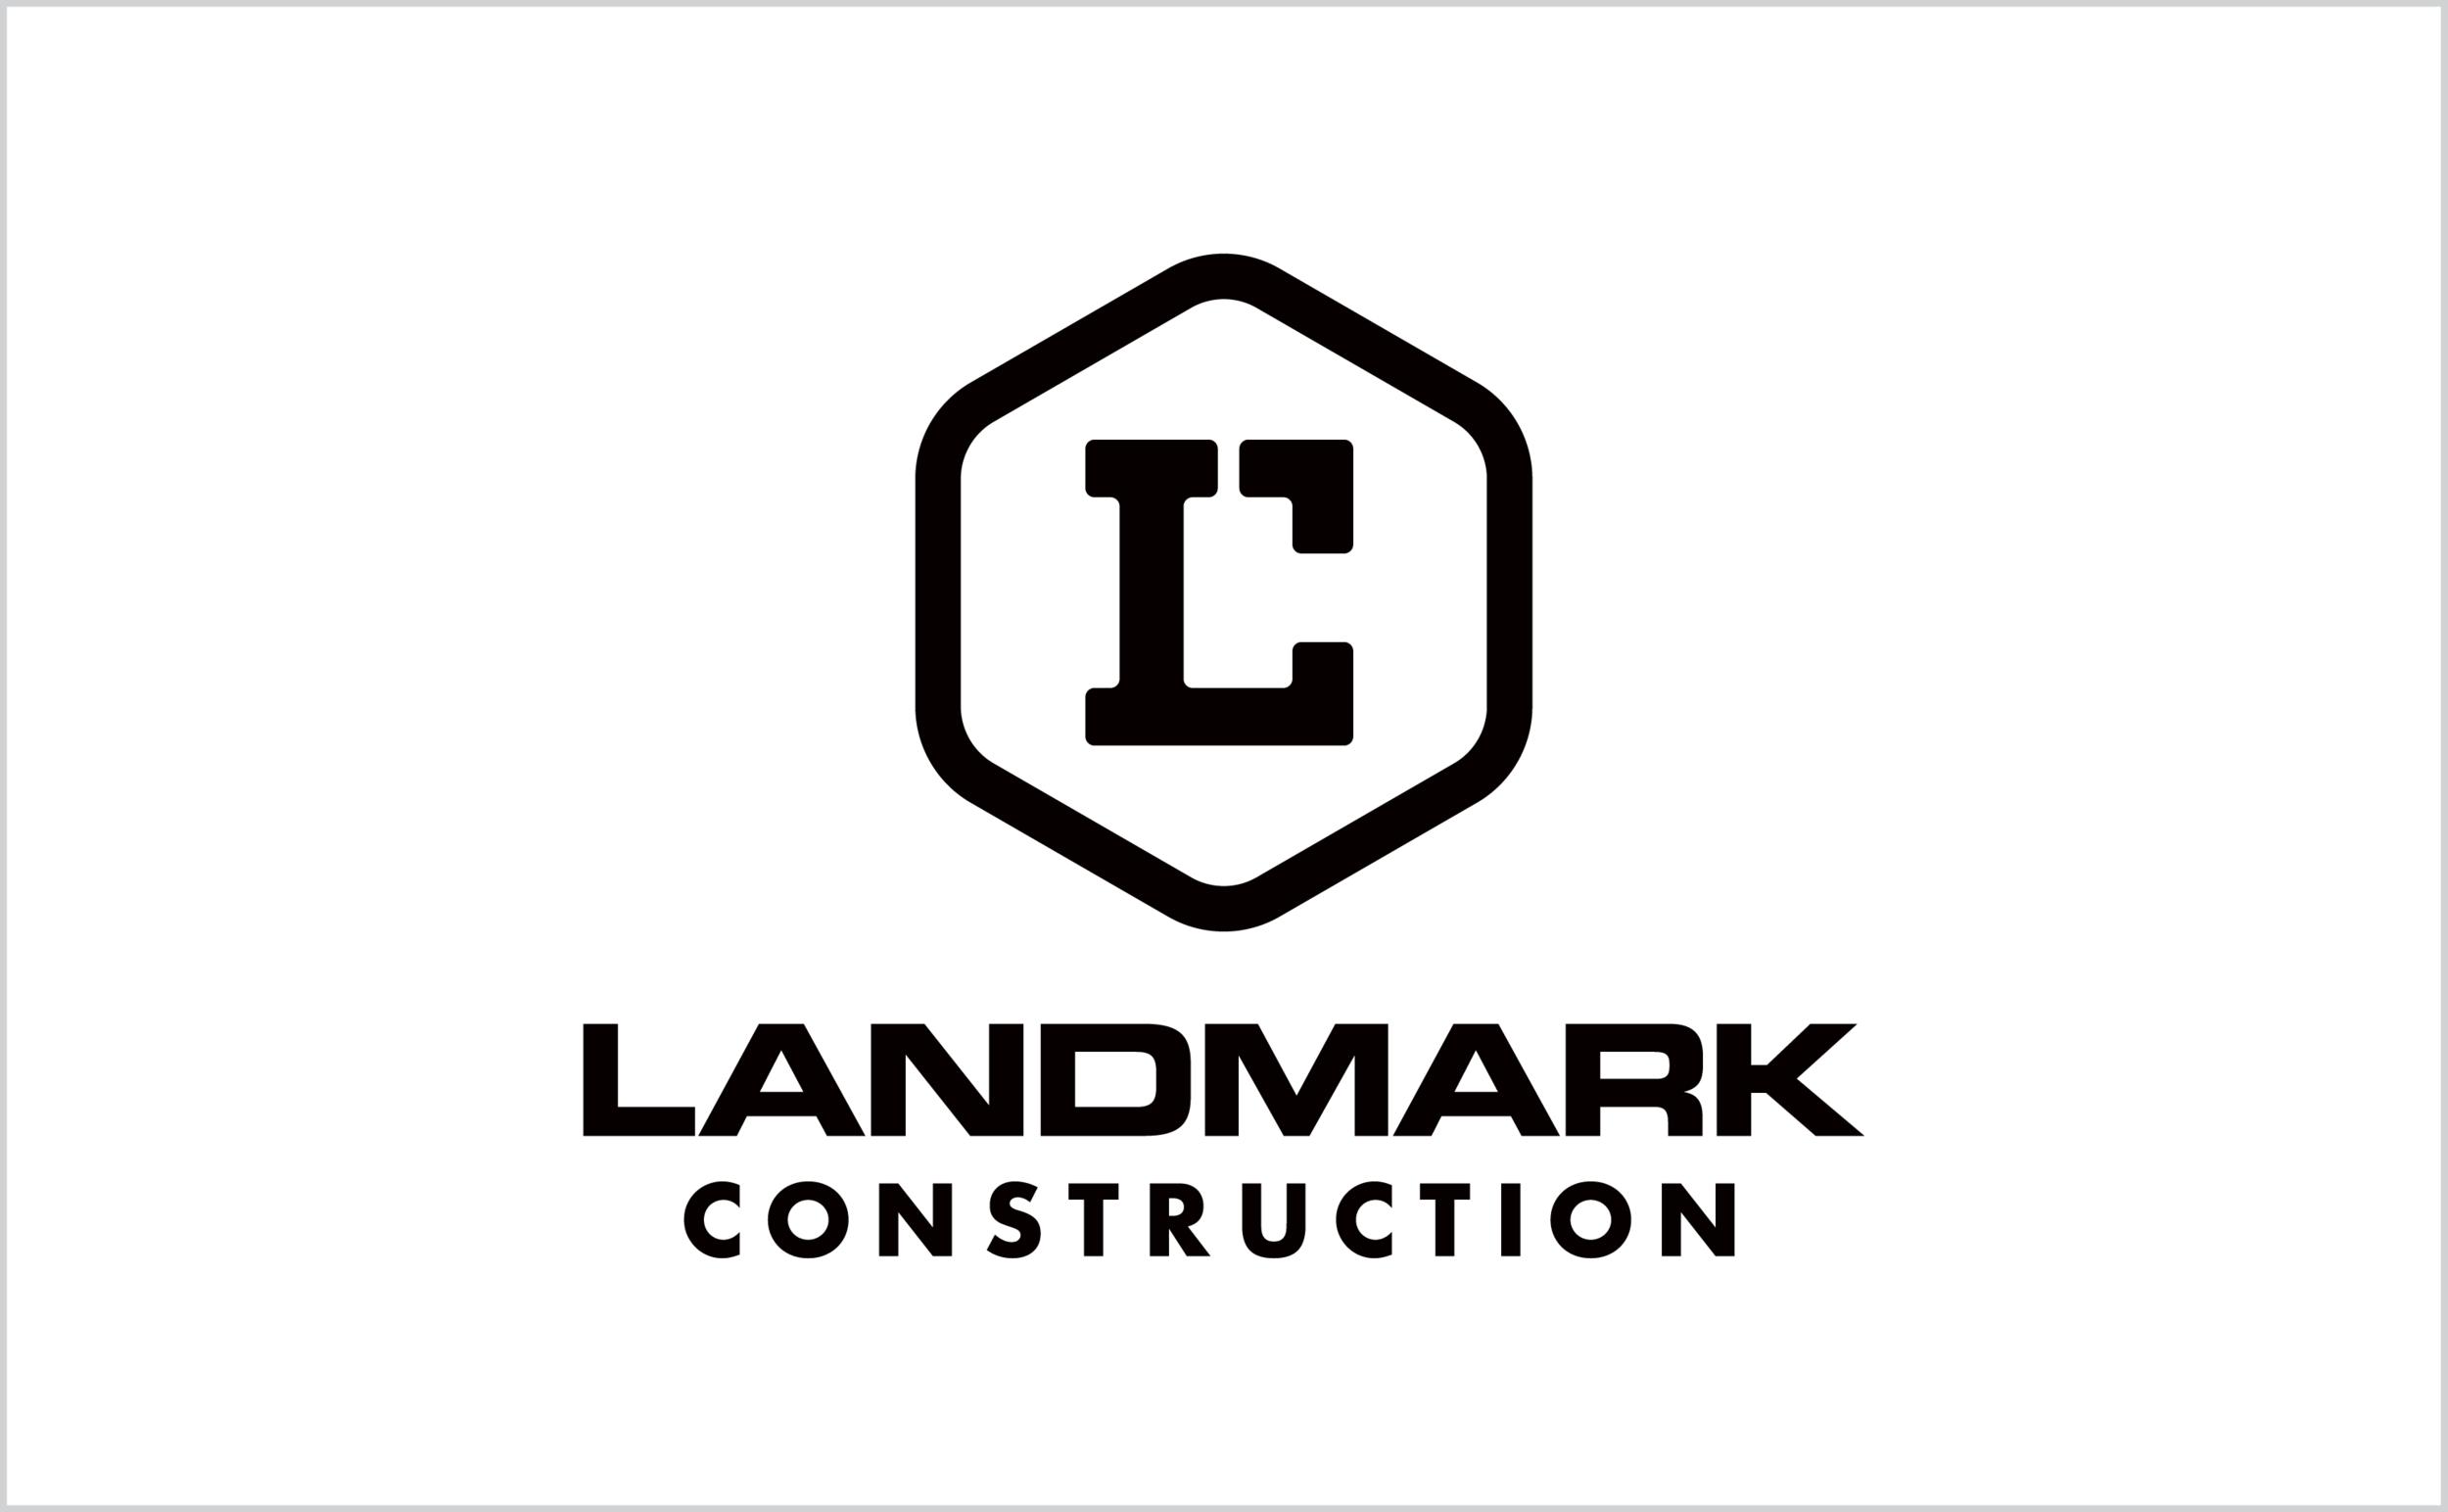 landmark_006.png